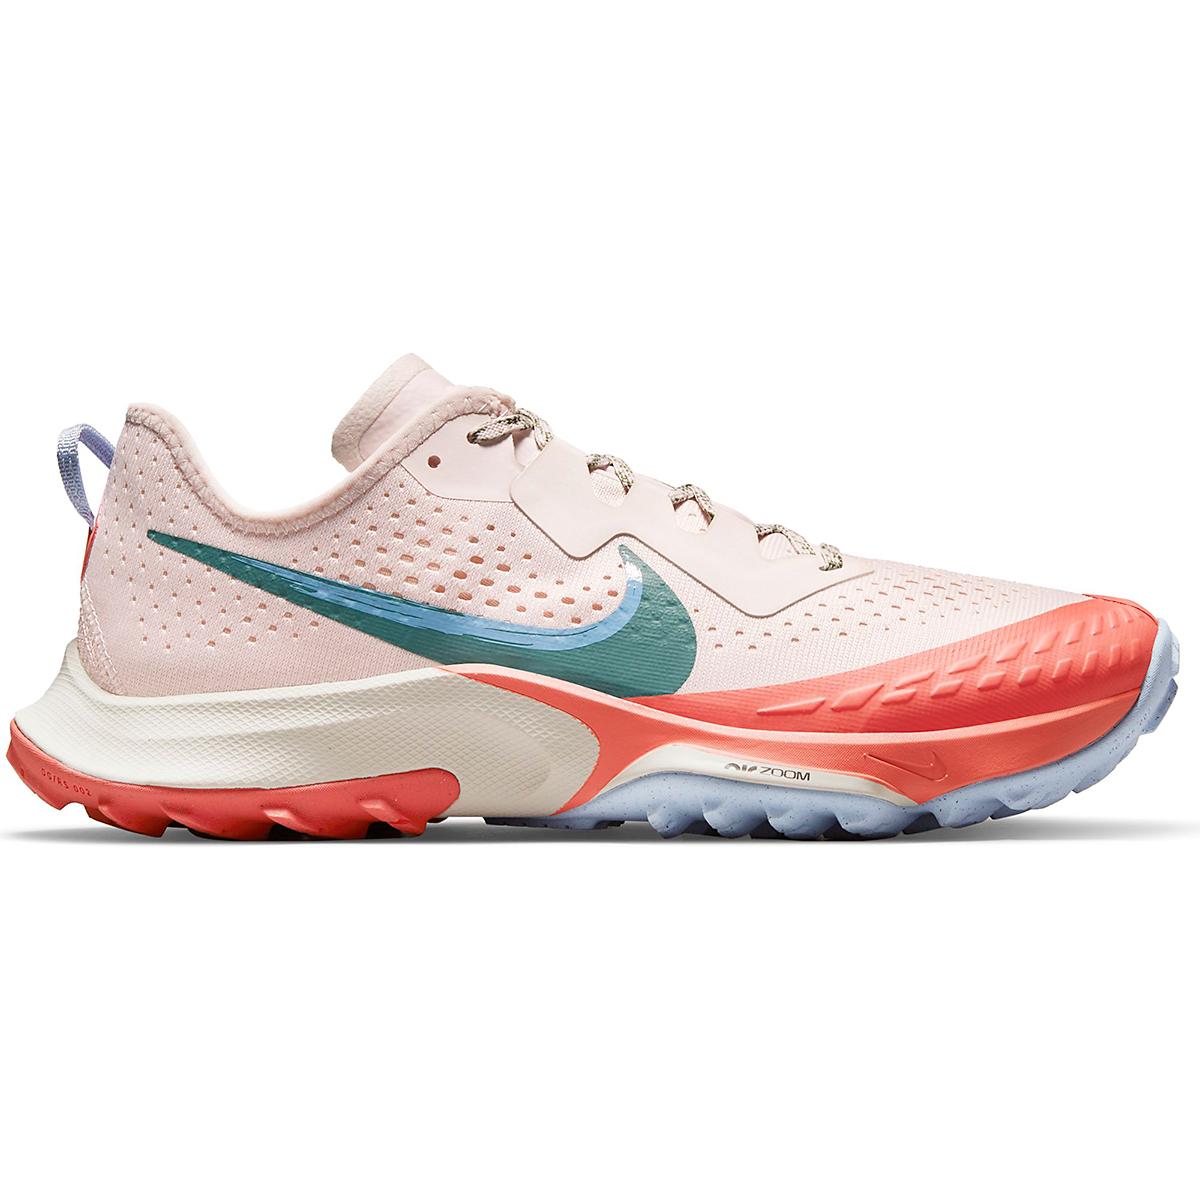 Women's Nike Air Zoom Terra Kiger 7 Trail Running Shoe - Color: Light Soft Pink/Bicoastal/Magic Ember - Size: 5 - Width: Regular, Light Soft Pink/Bicoastal/Magic Ember, large, image 1